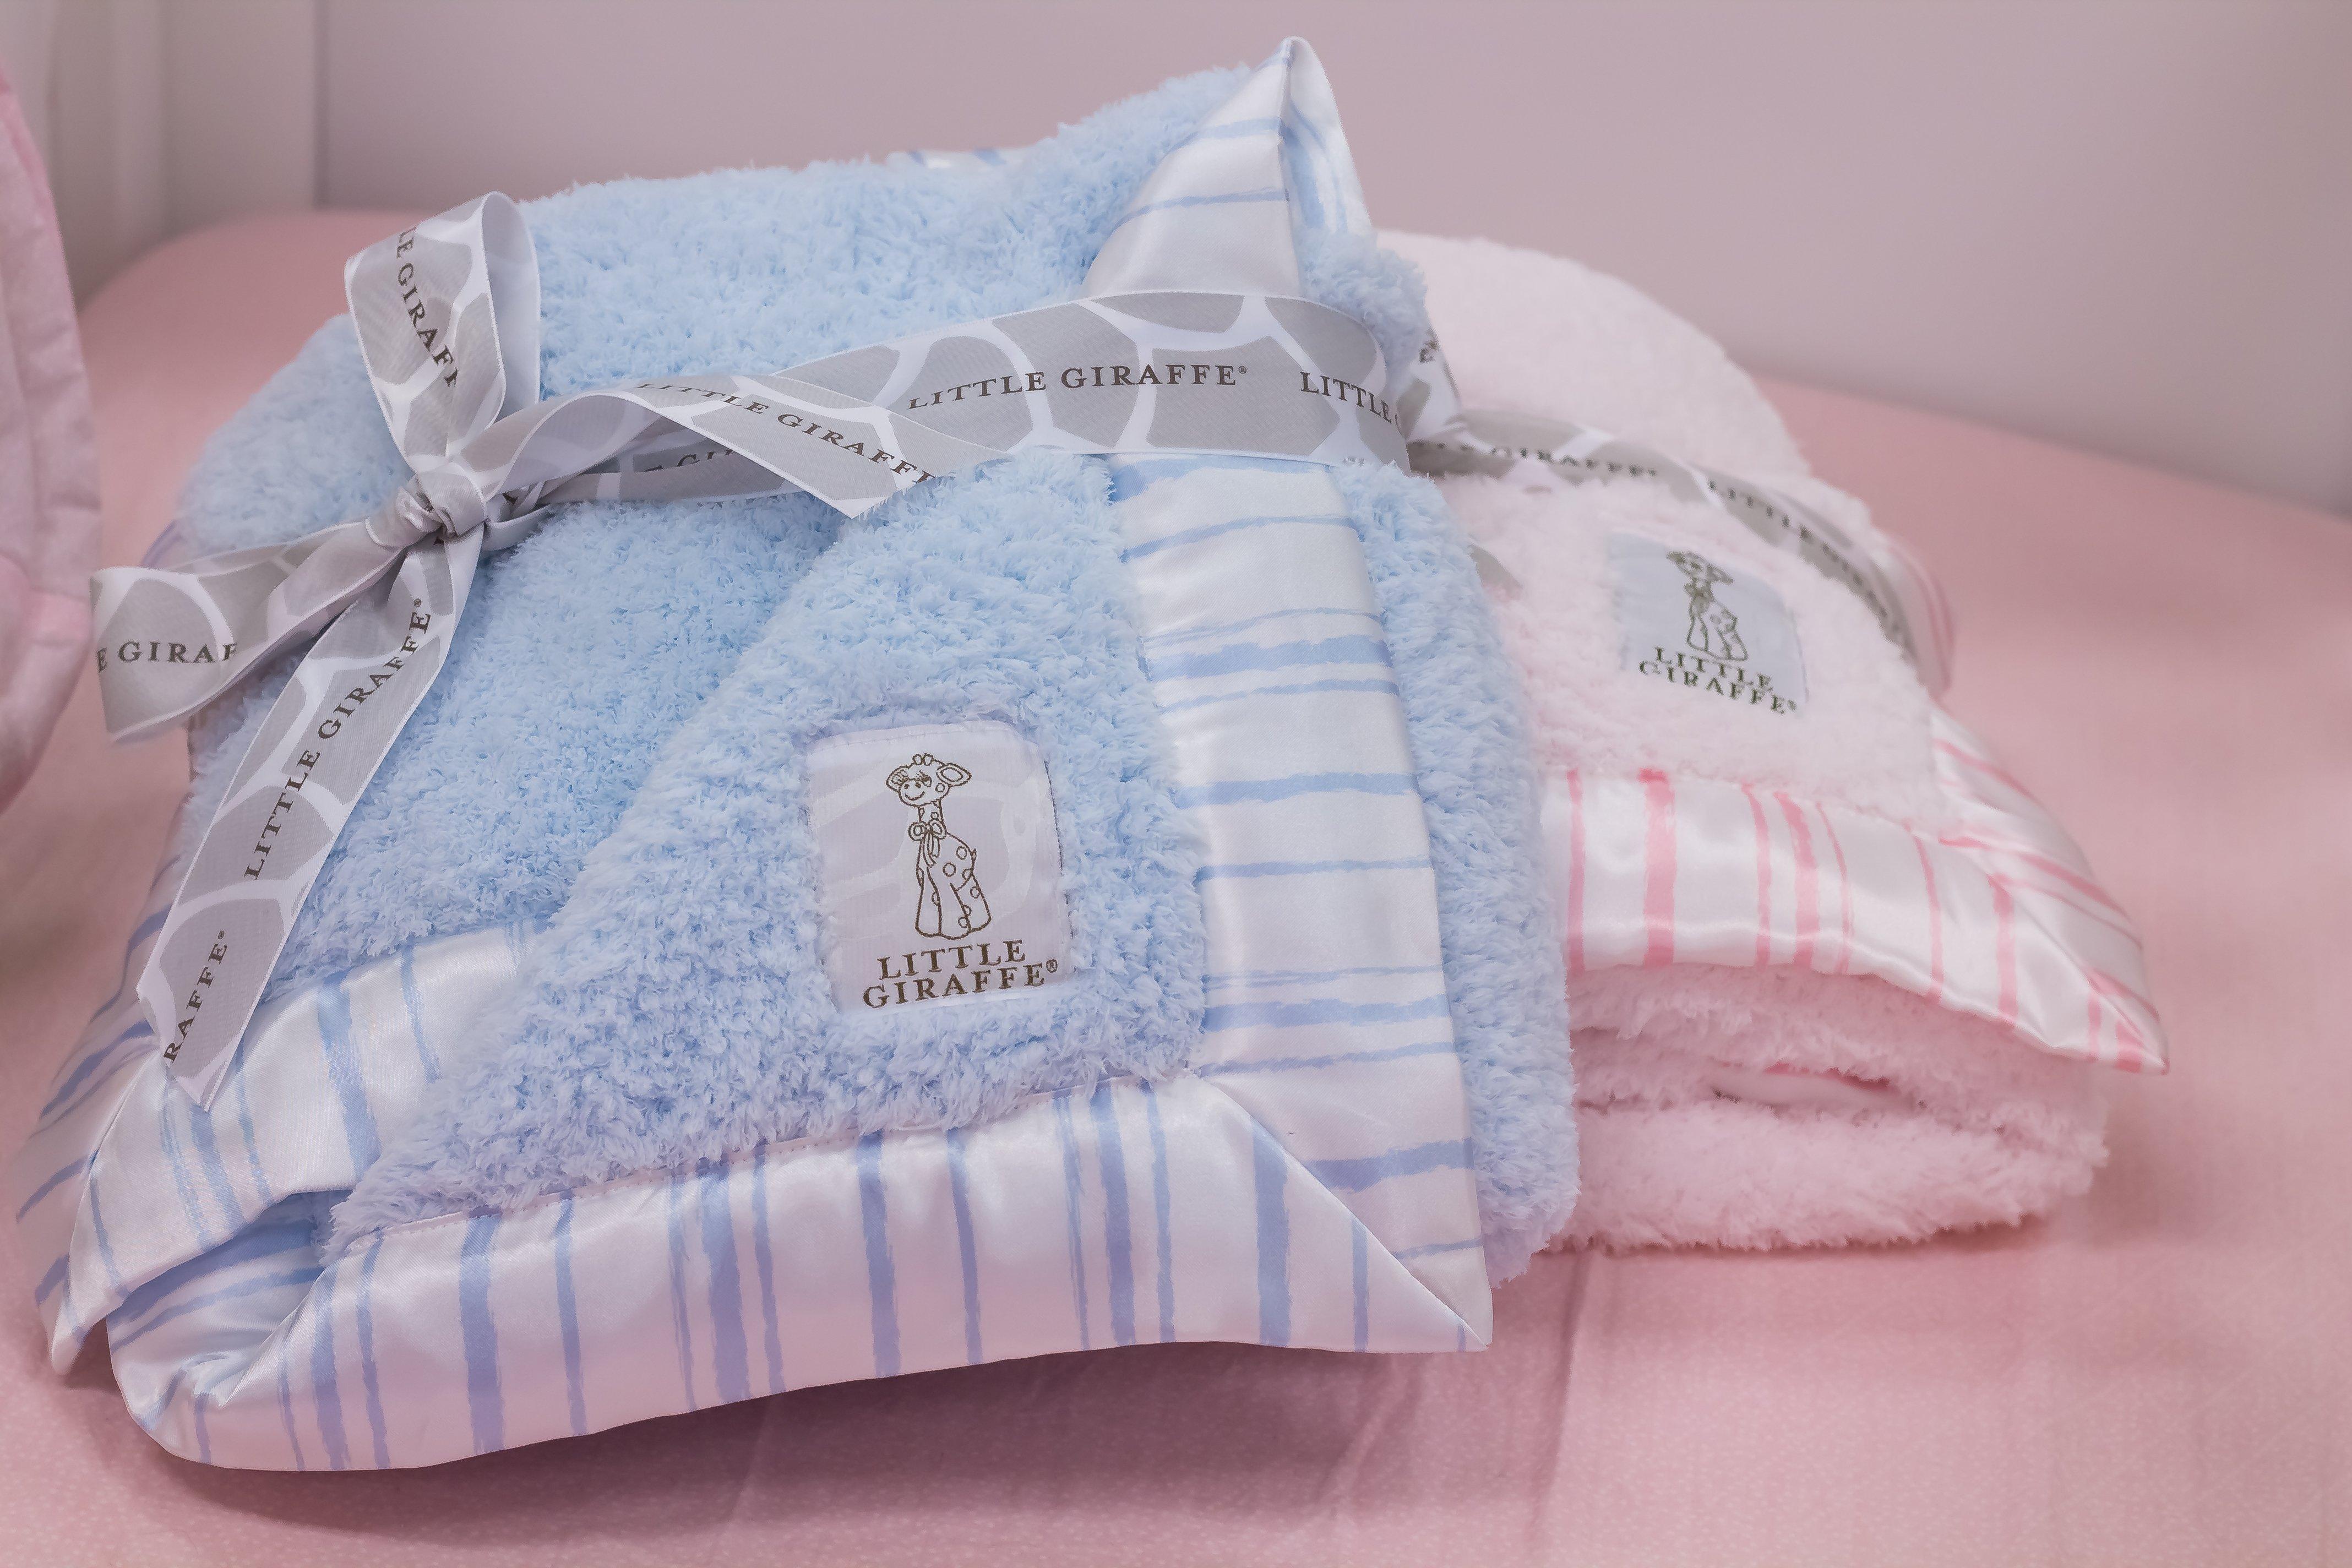 Little Giraffe Blankets